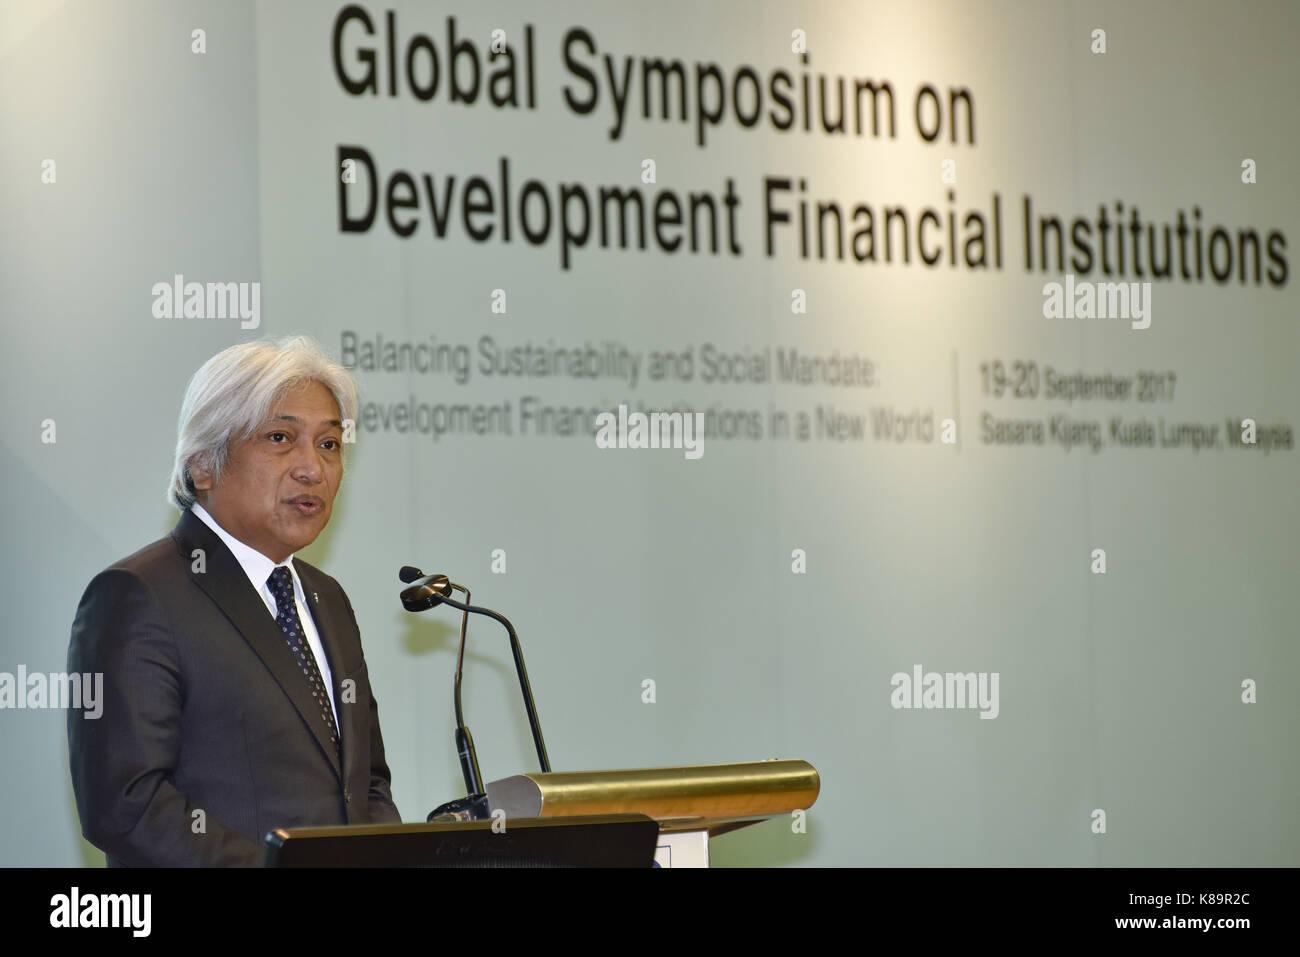 Kuala Lumpur, Malaysia. 19th Sep, 2017. Governor Muhammad bin Ibrahim, Bank Negara (the Central Bank)Â Malaysia - Stock Image